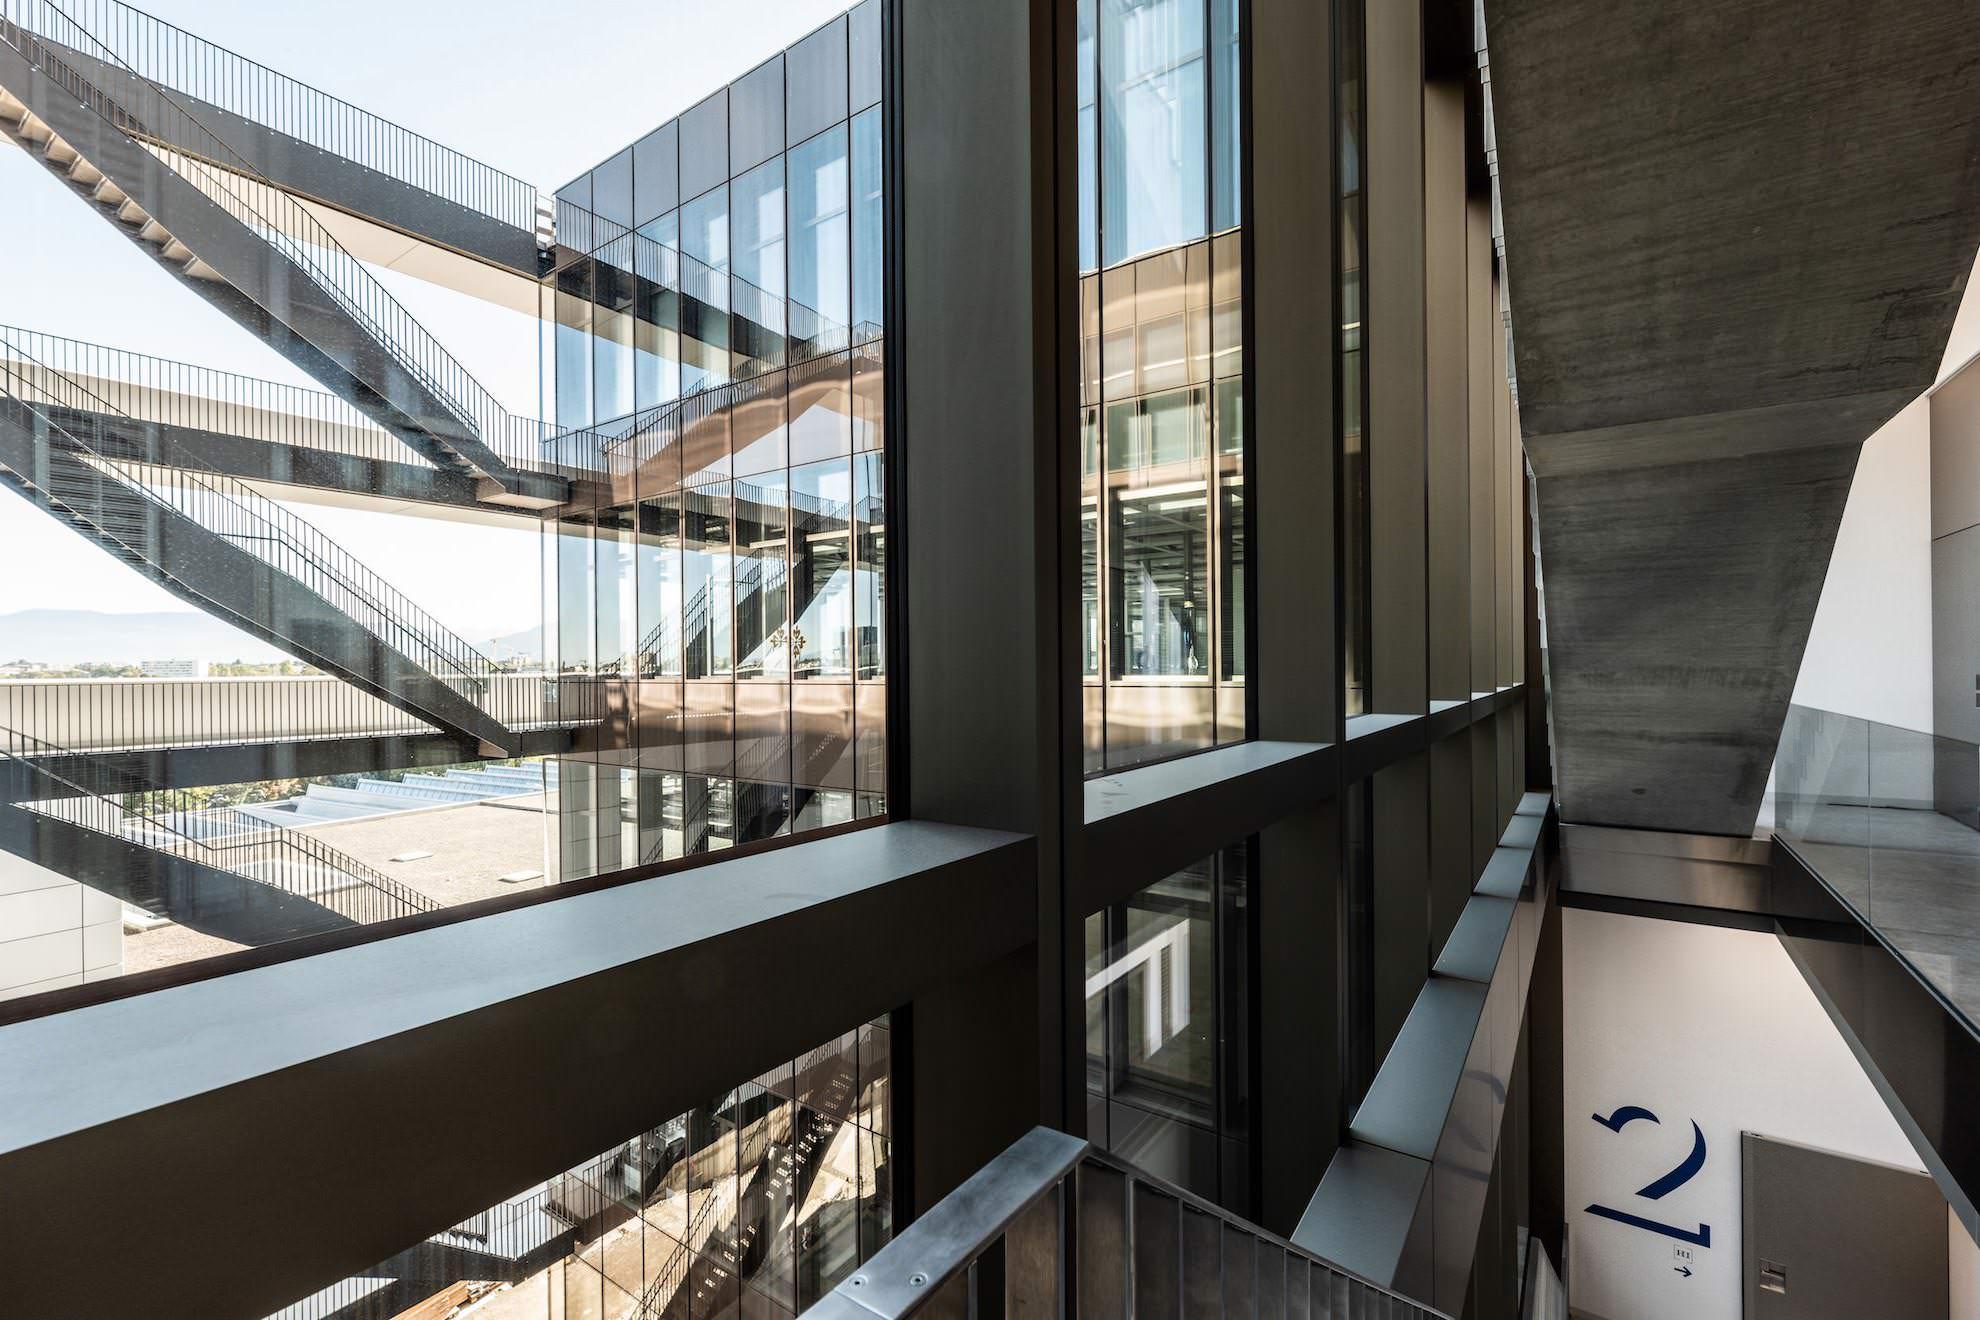 Das neue Manufakturgebäude in Plan-les-Ouates